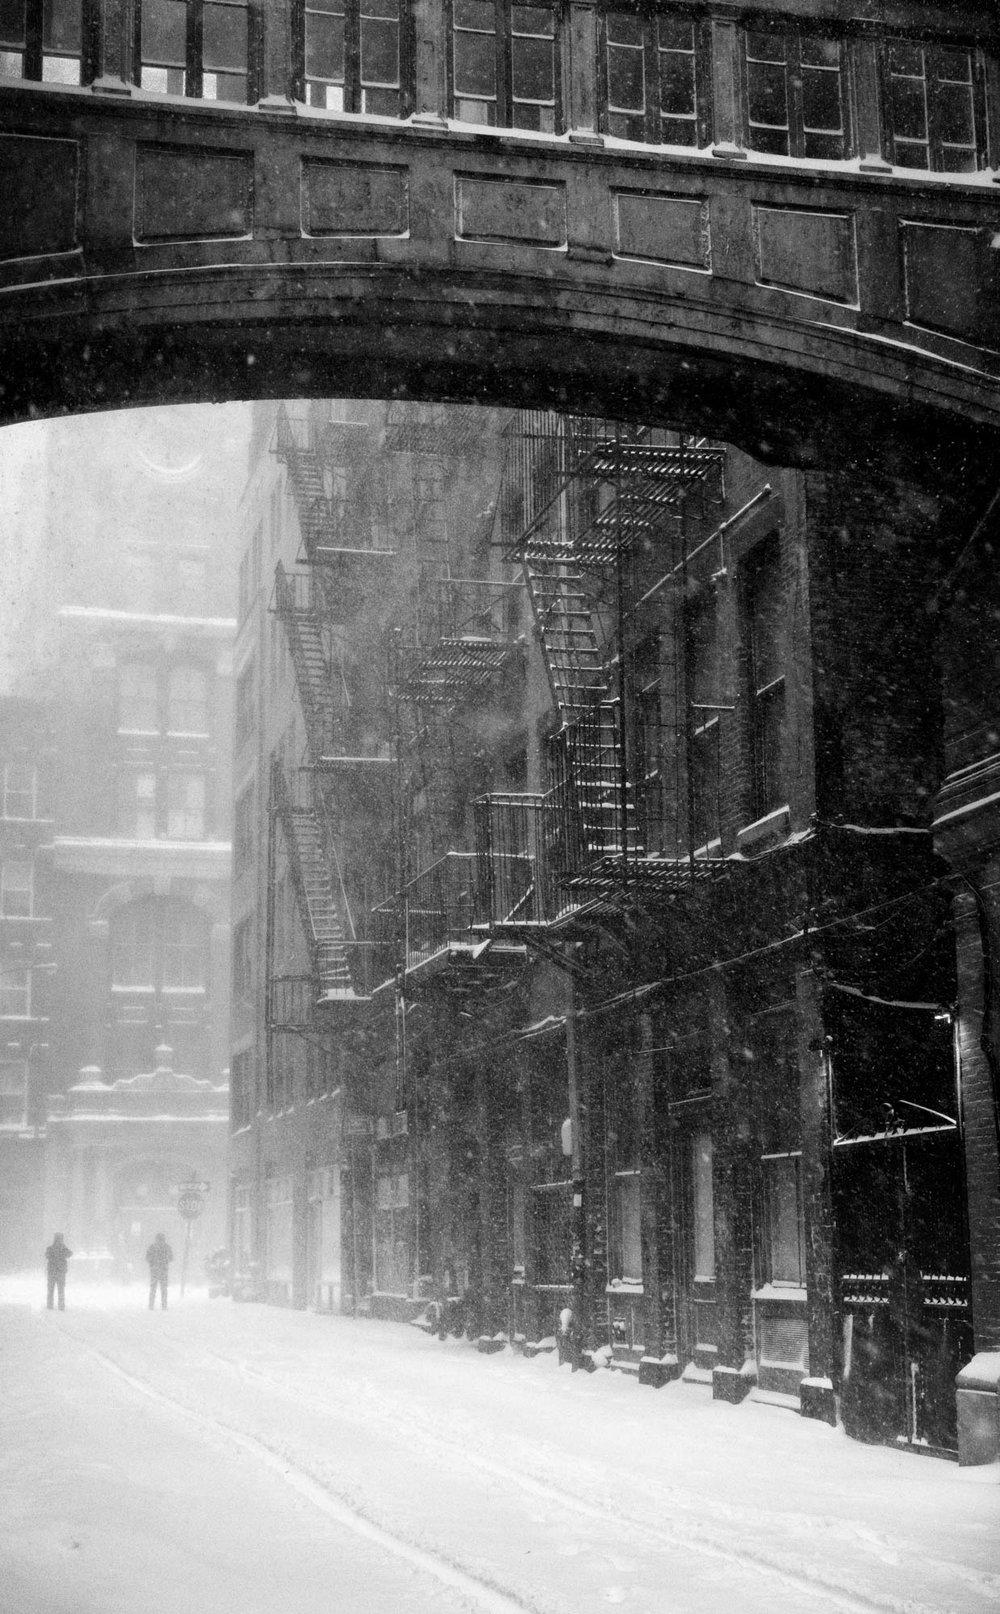 180104_NYC_Snowstorm_View_100.jpg